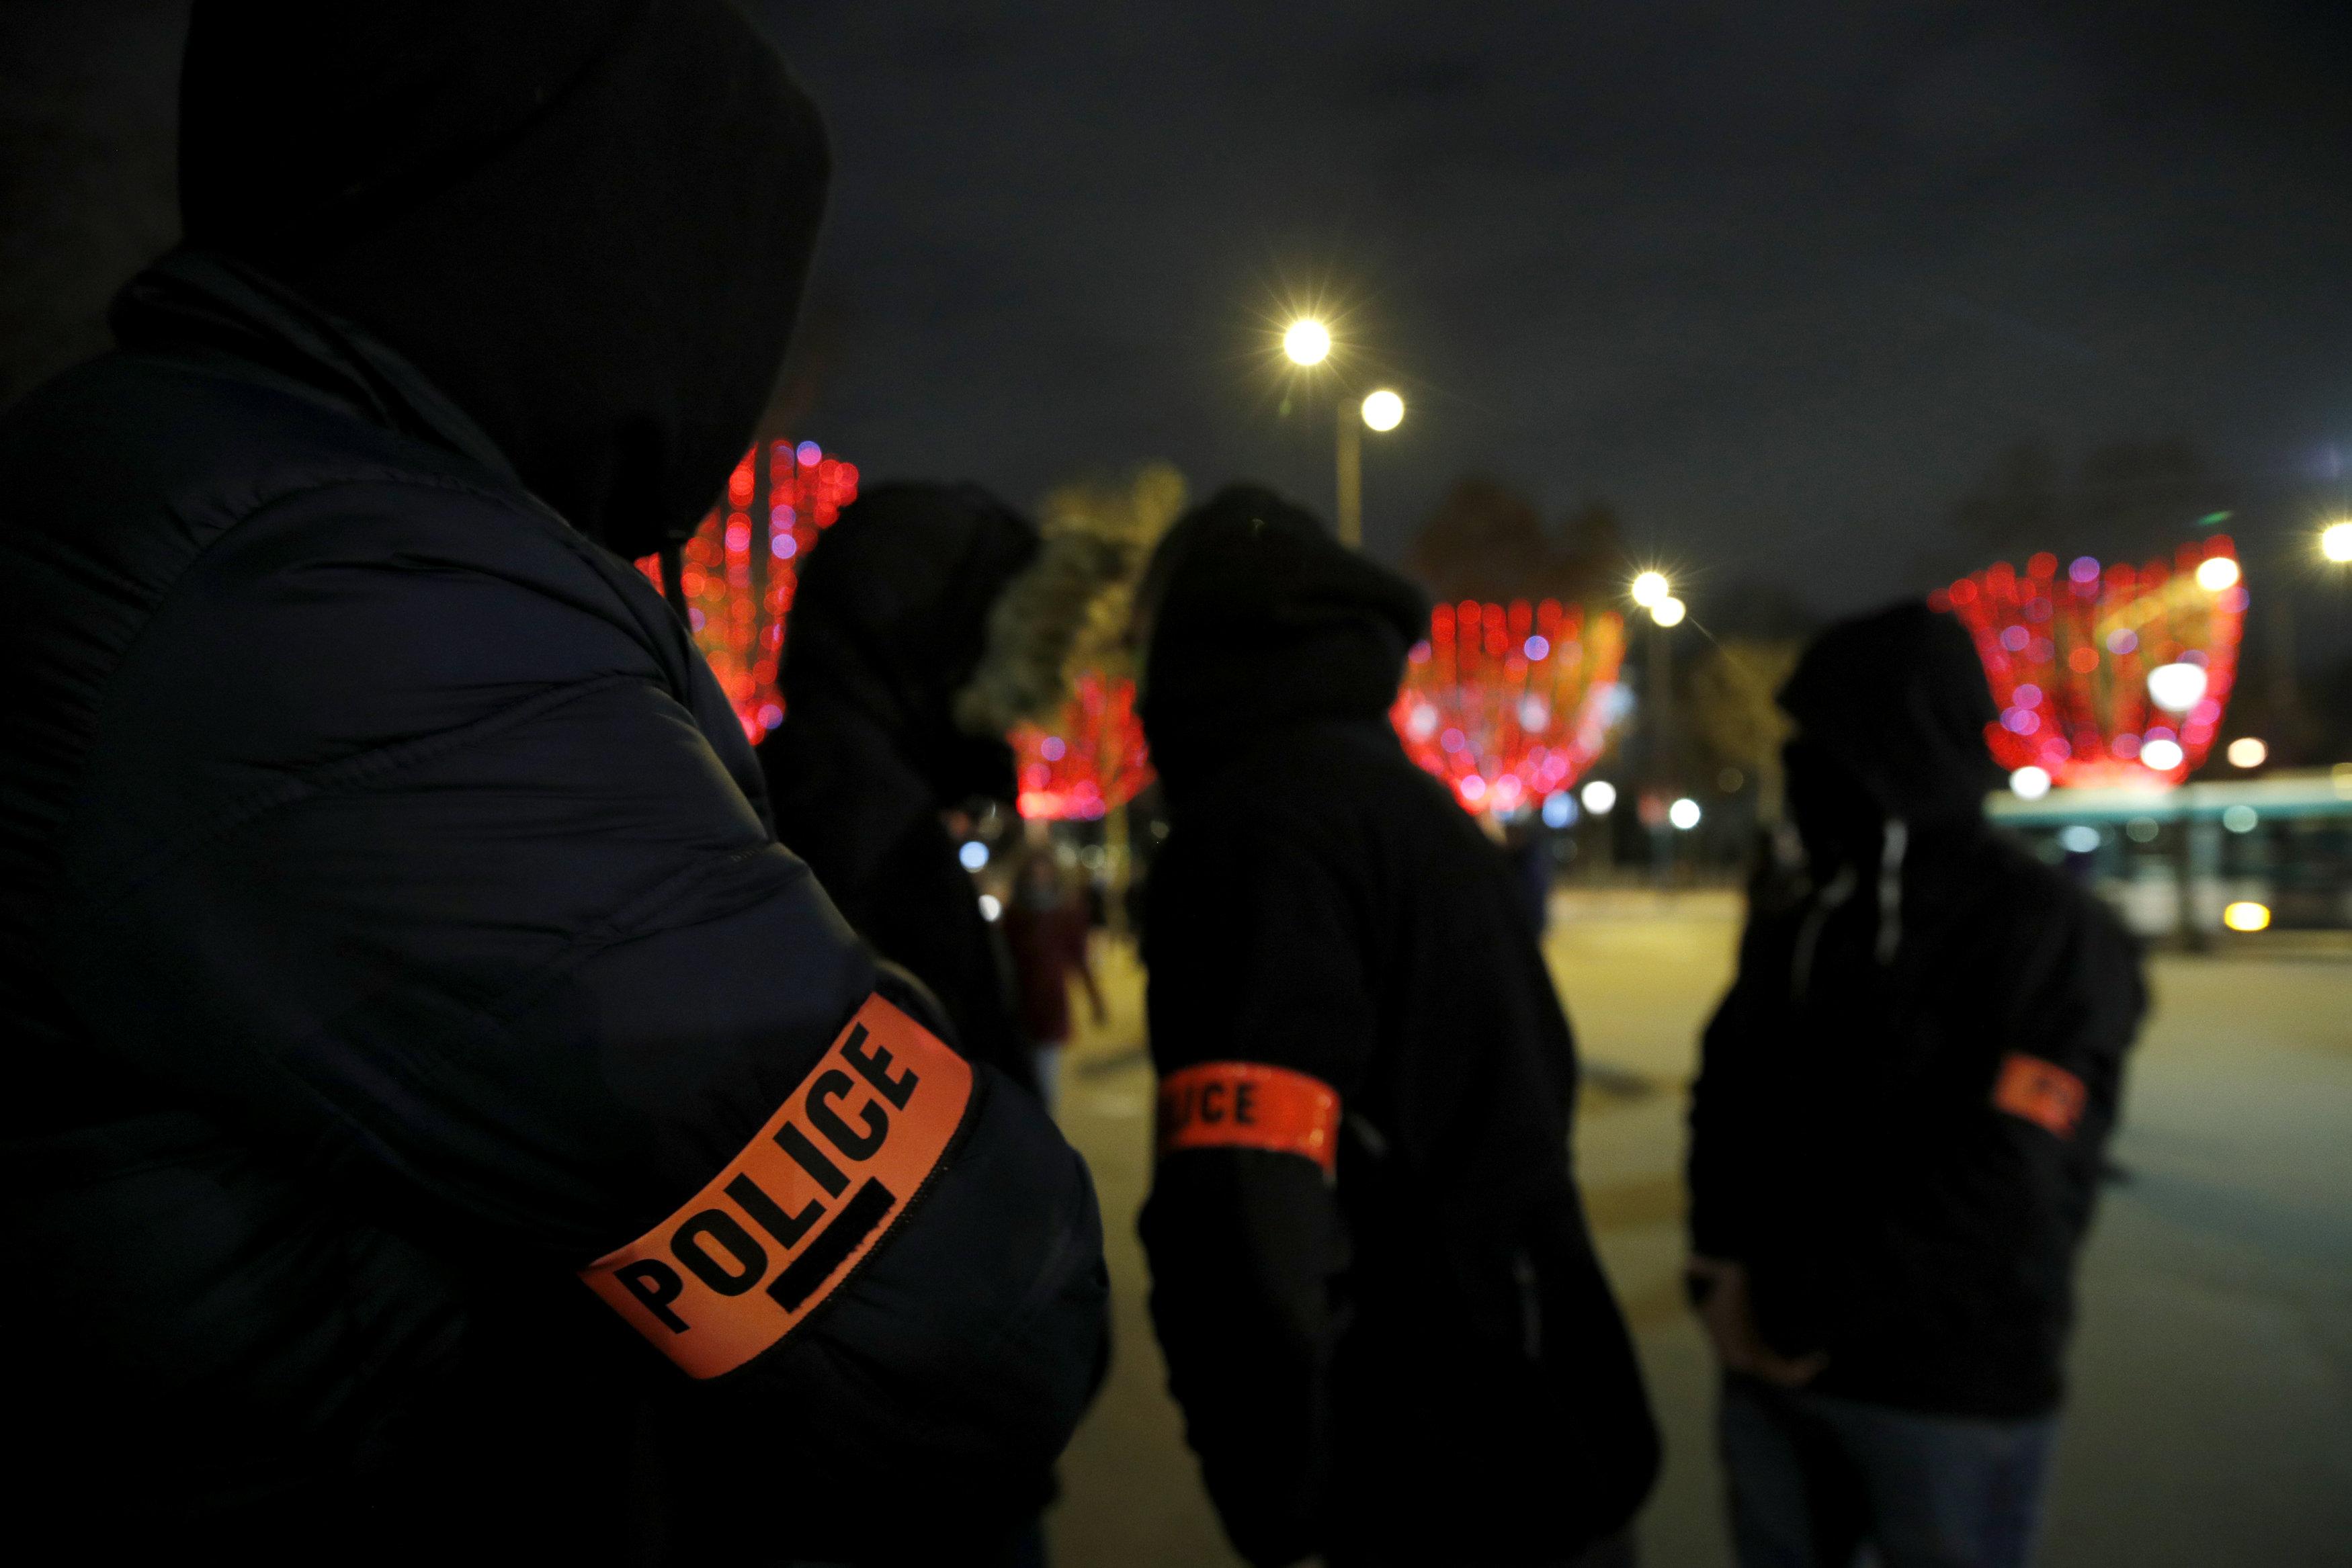 2018-12-20T222525Z_1906406261_RC1D4E430C50_RTRMADP_3_FRANCE-PROTESTS-POLICE